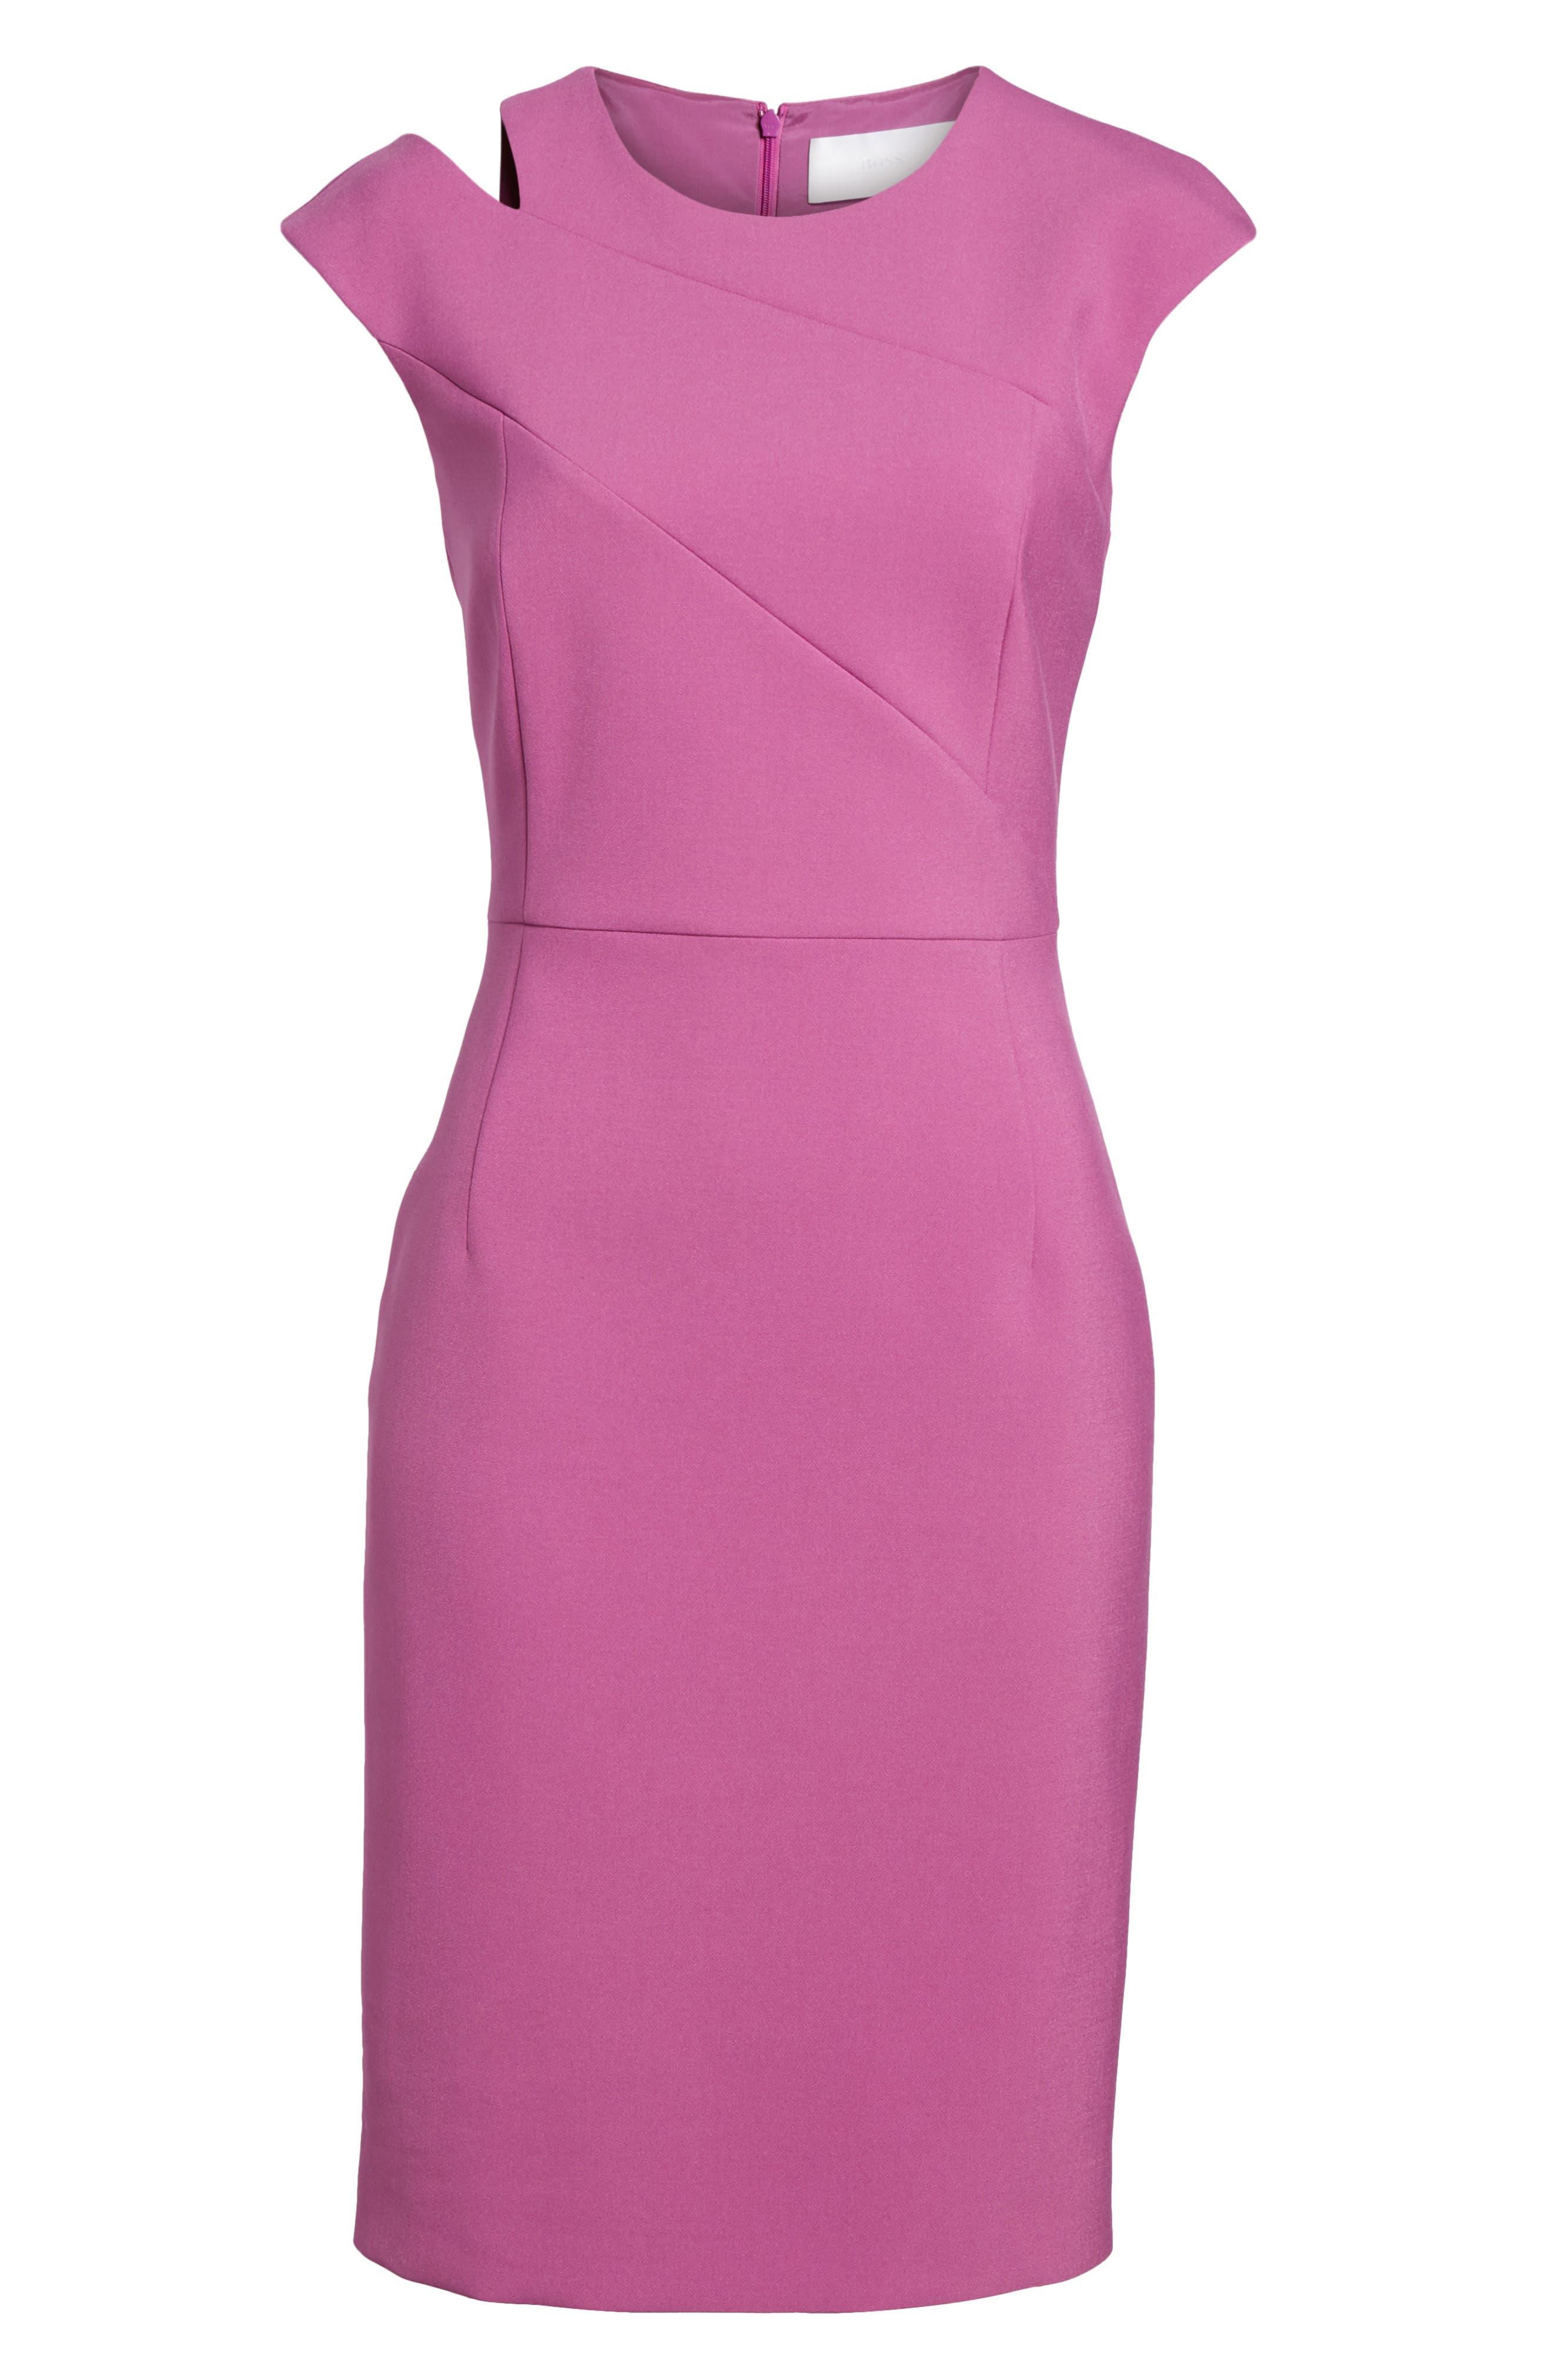 Danouk Ponte Sheath Dress,                             Alternate thumbnail 6, color,                             511